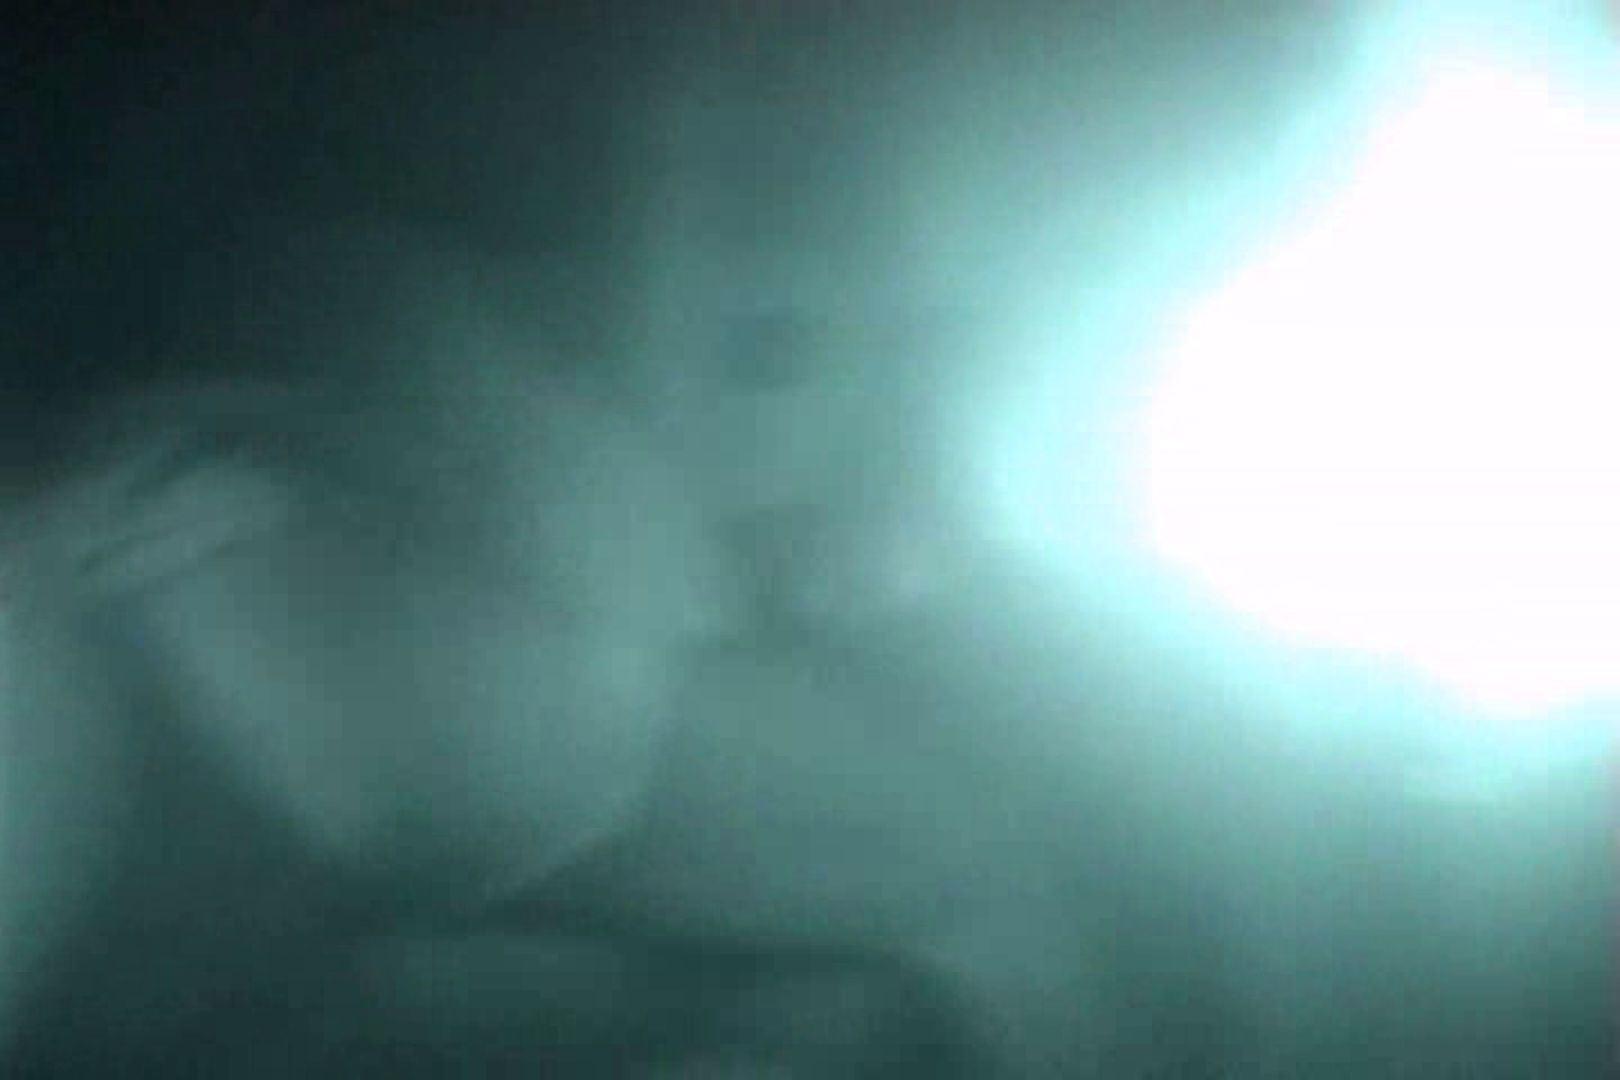 充血監督の深夜の運動会Vol.136 赤外線  106枚 45